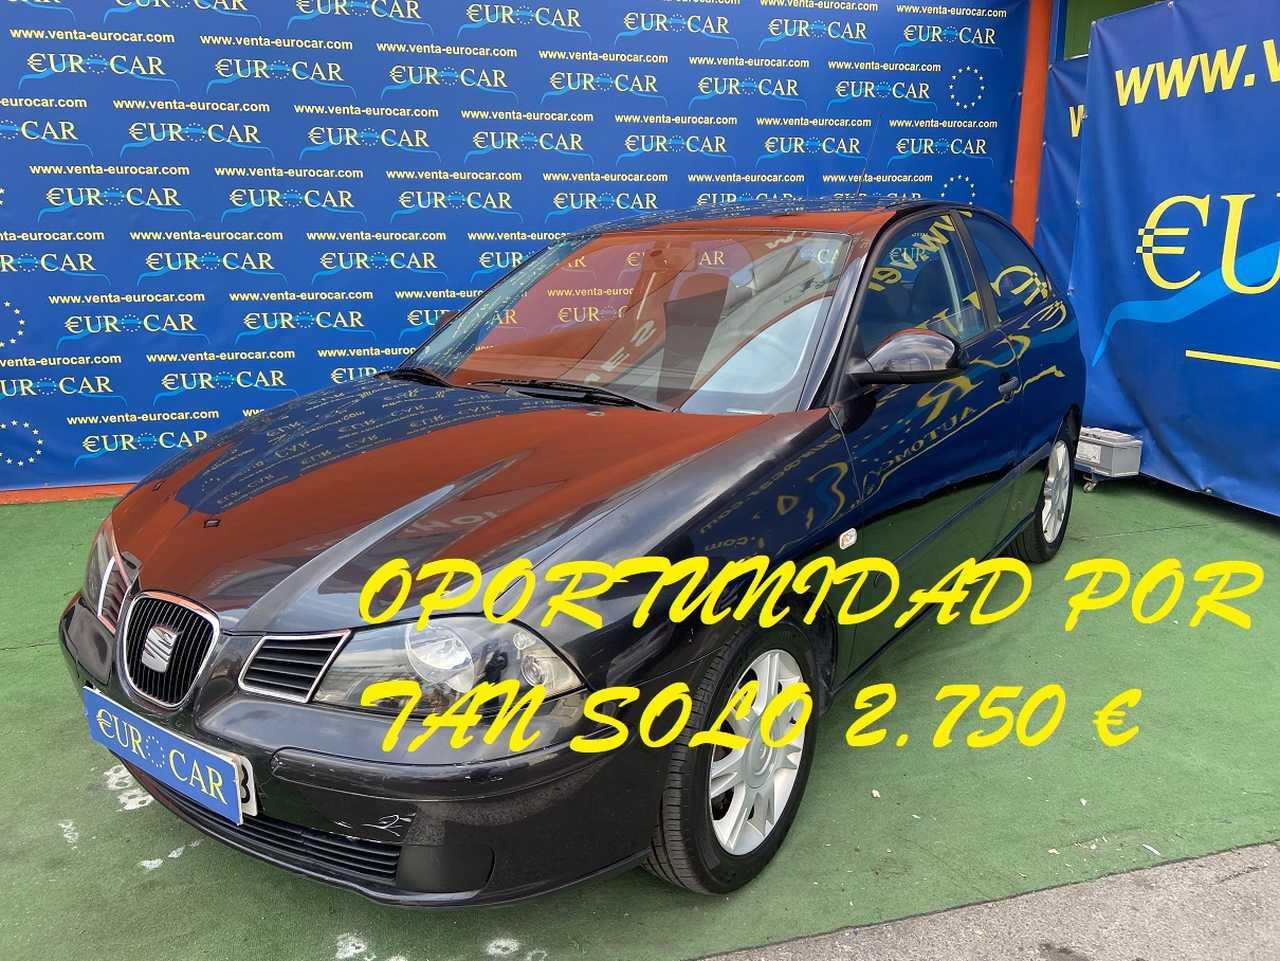 Seat Ibiza ocasión segunda mano 2005 Gasolina por 2.750€ en Alicante